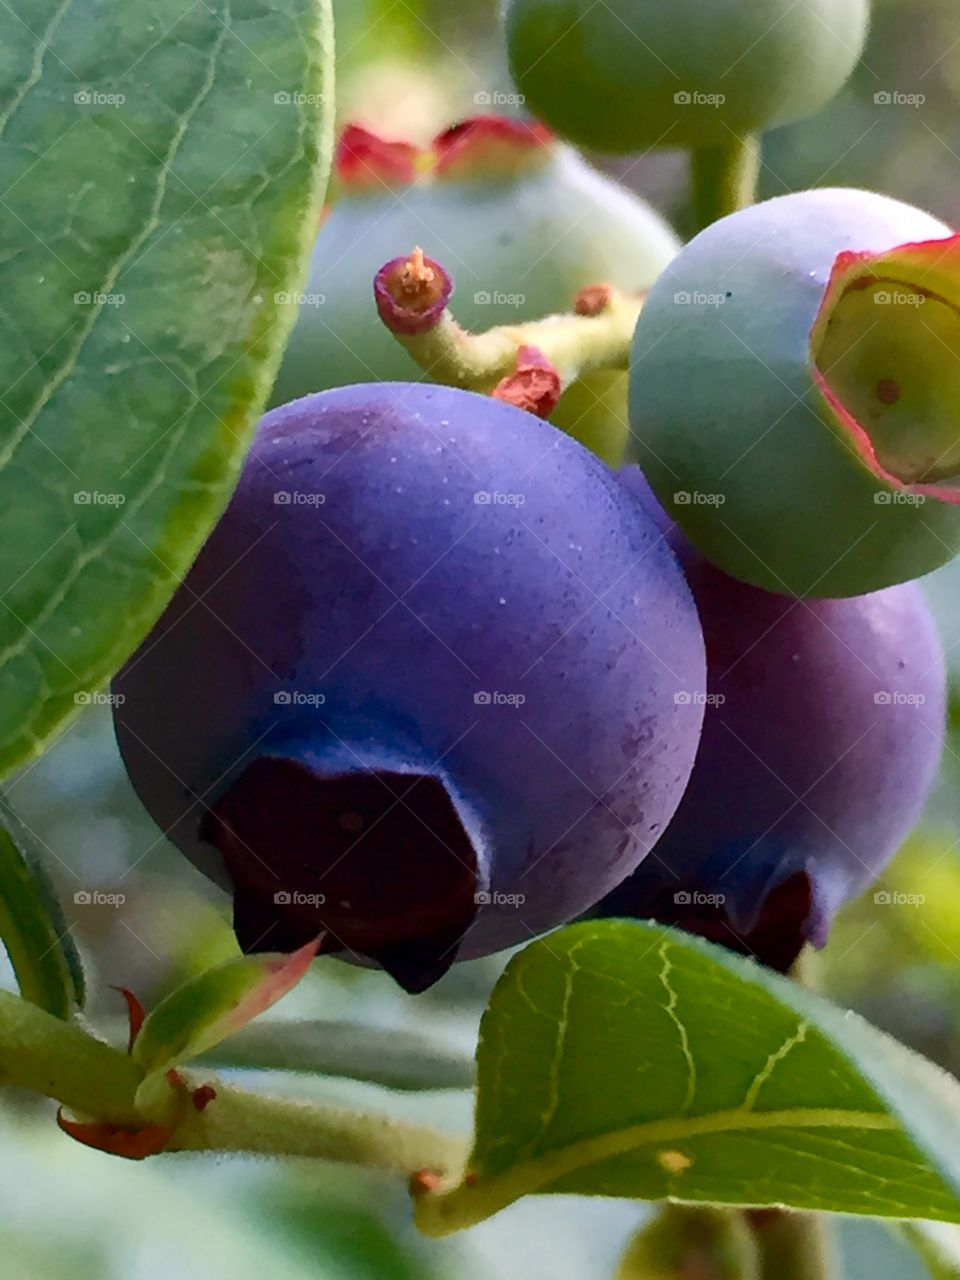 Plumping blueberries